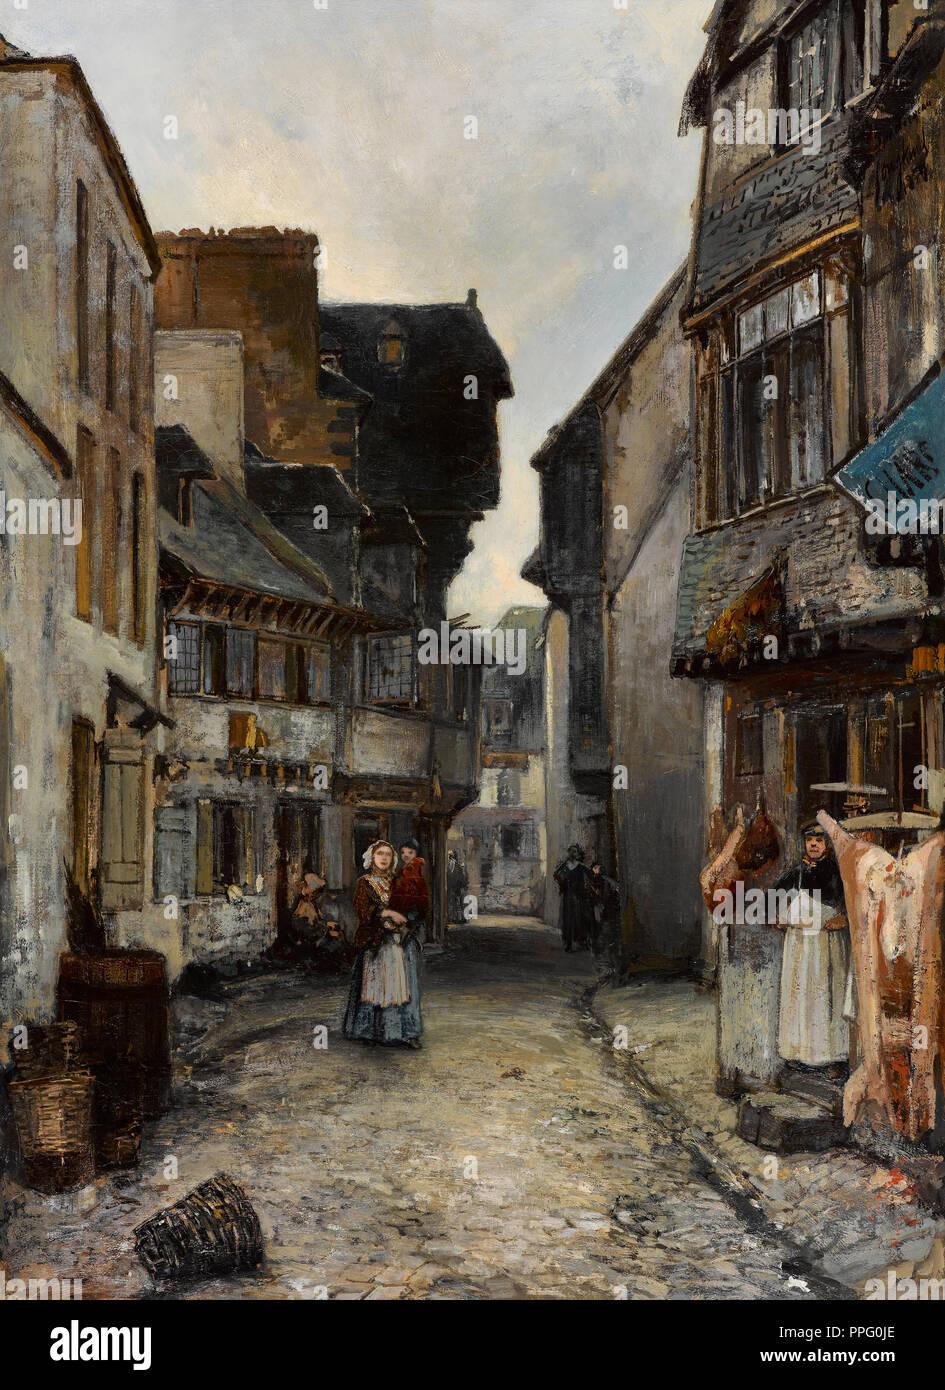 Johan Jongkind - una calle en Landerneau 1851 Óleo sobre lienzo. Gemeentemuseum Den Haag, La Haya, Países Bajos. Imagen De Stock